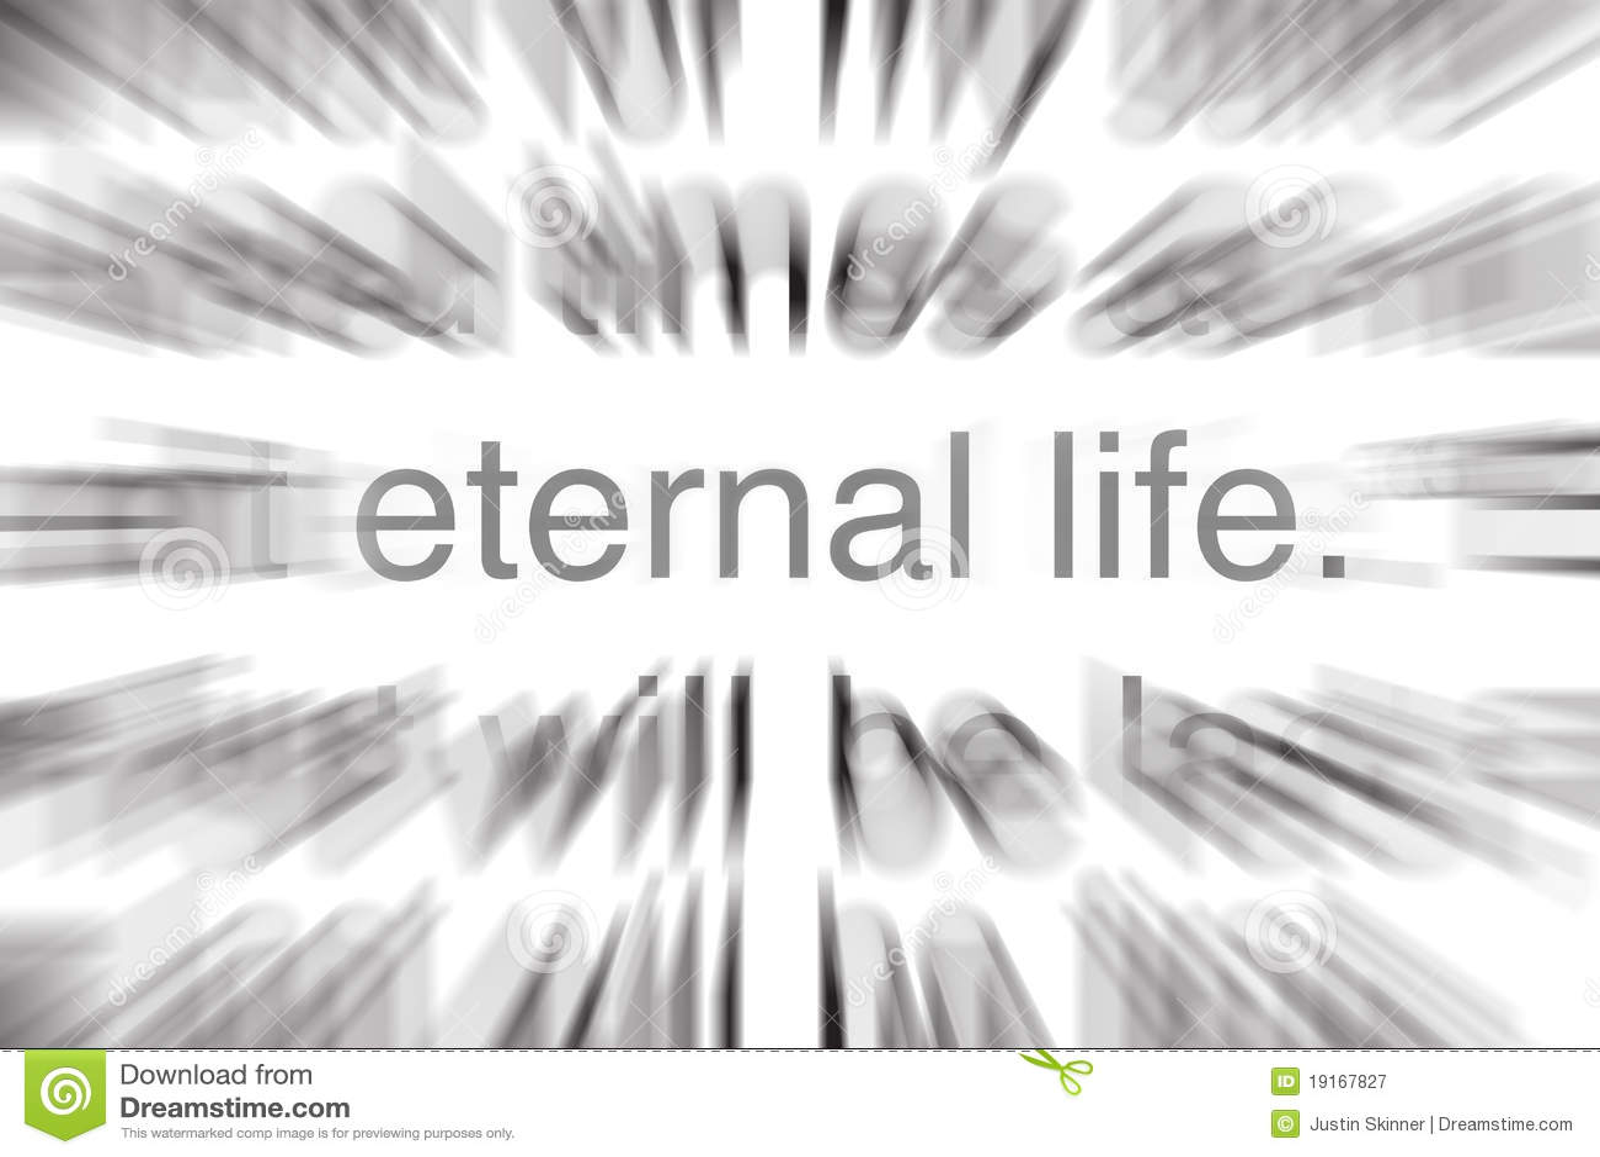 Vita eterna nella sacra scrittura